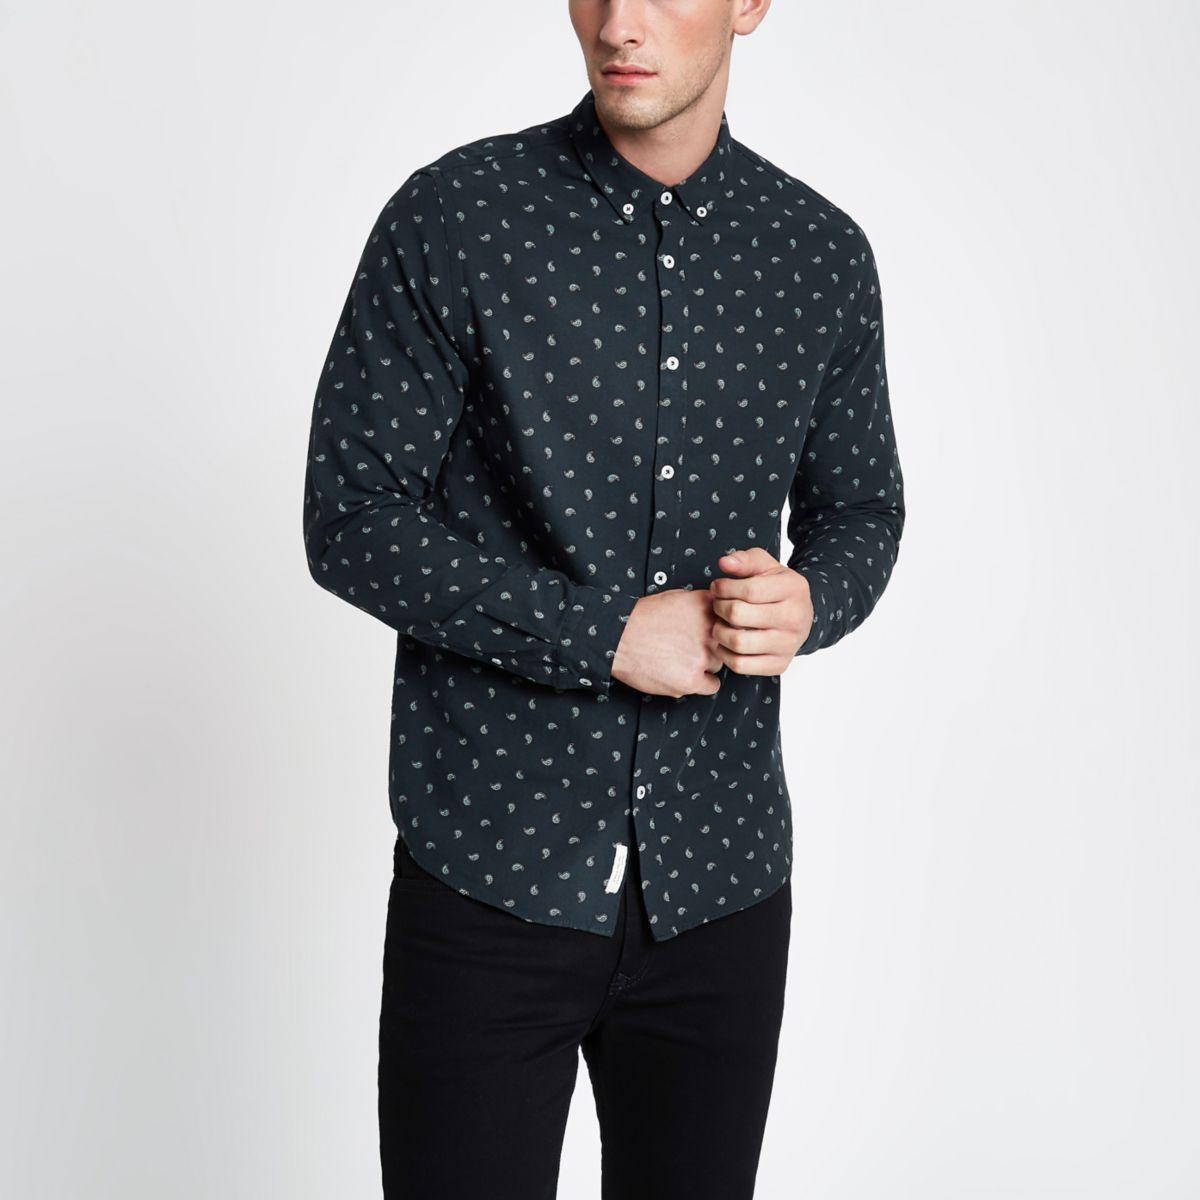 Navy Paisley Long Sleeve Oxford Shirt Shirts Sale Men